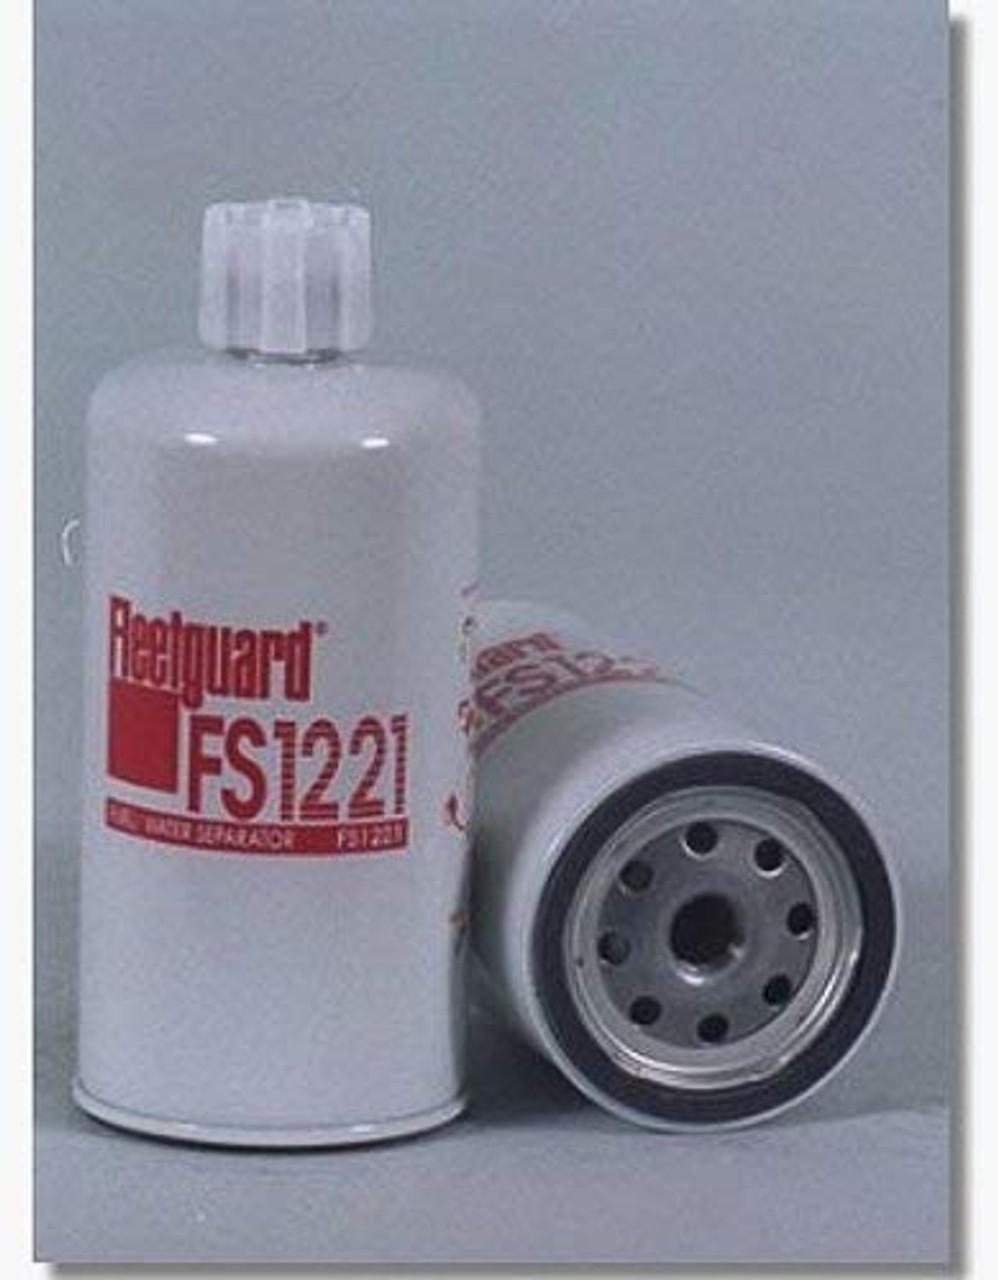 Fleetguard FS1221 Fuel Separator Spinon